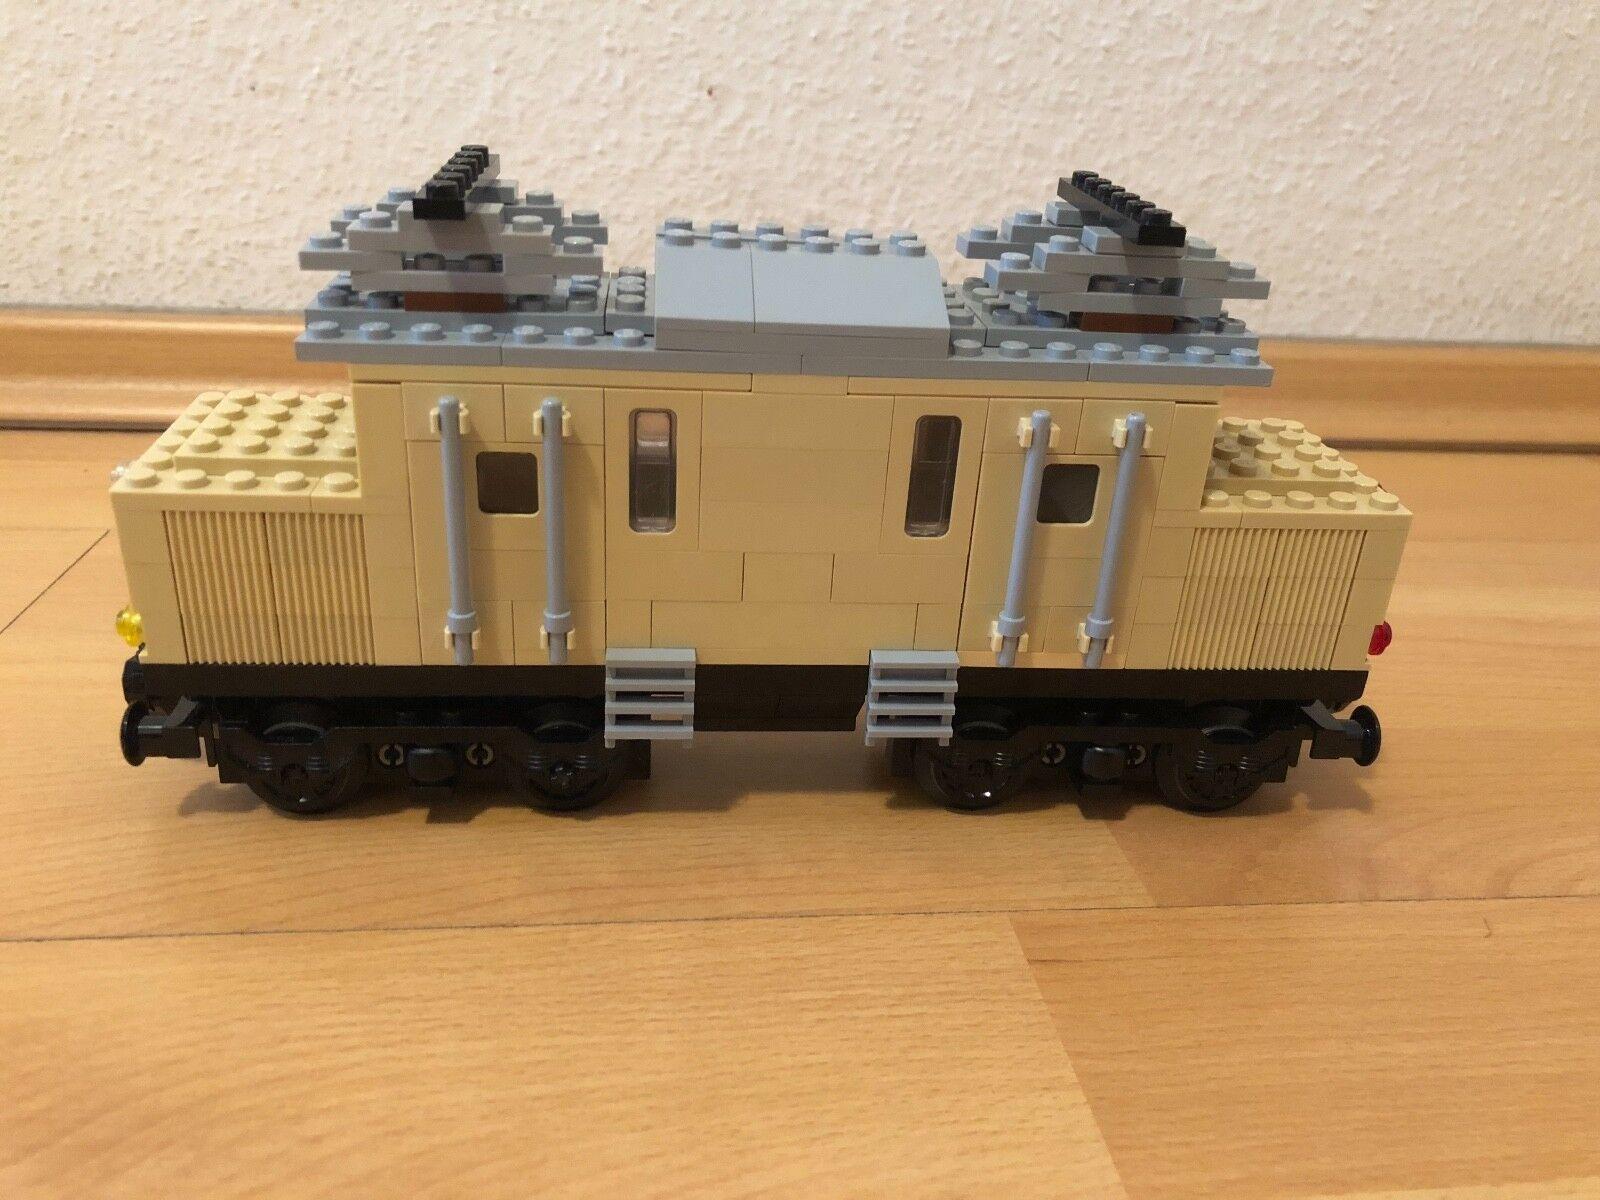 Lego 7777 Idea Book Train Eisenbahn B Version (tan) Krokodil for Powered Up 12V